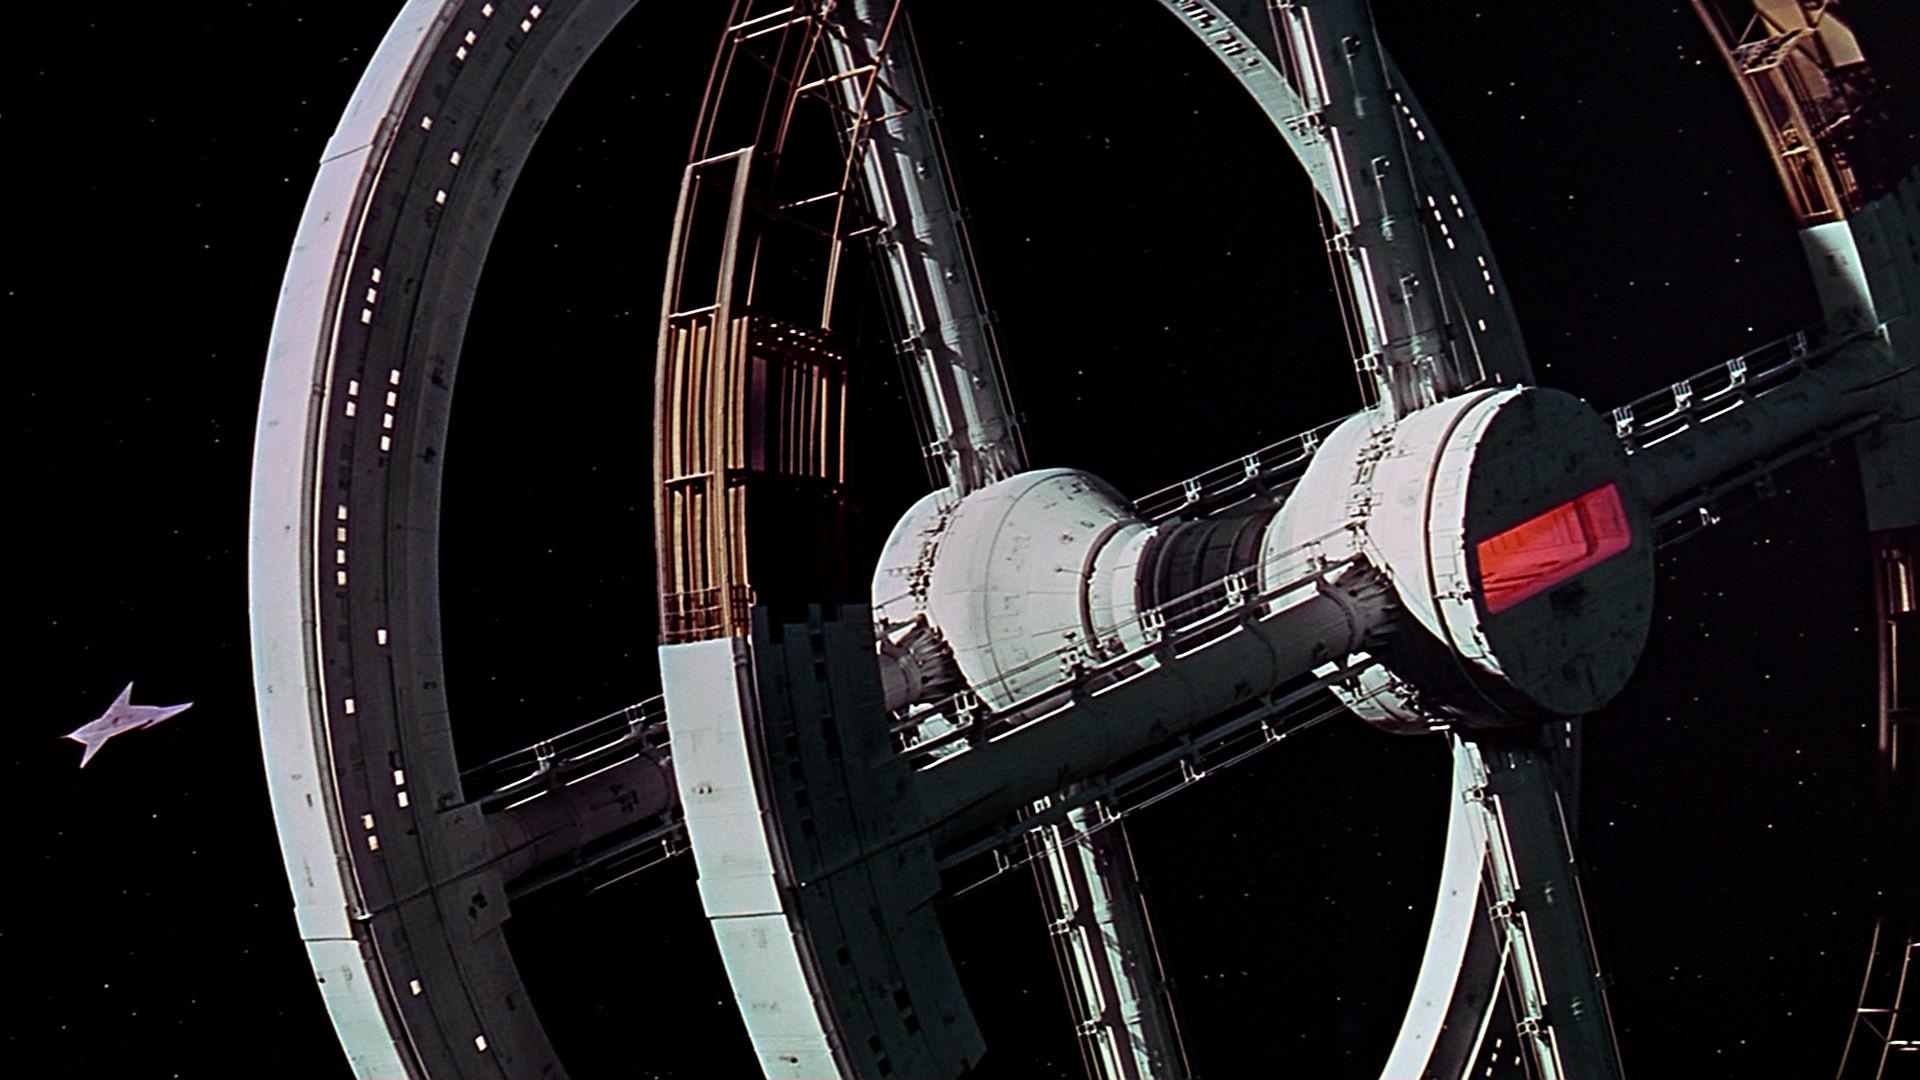 74 2001 A Space Odyssey Wallpaper On Wallpapersafari